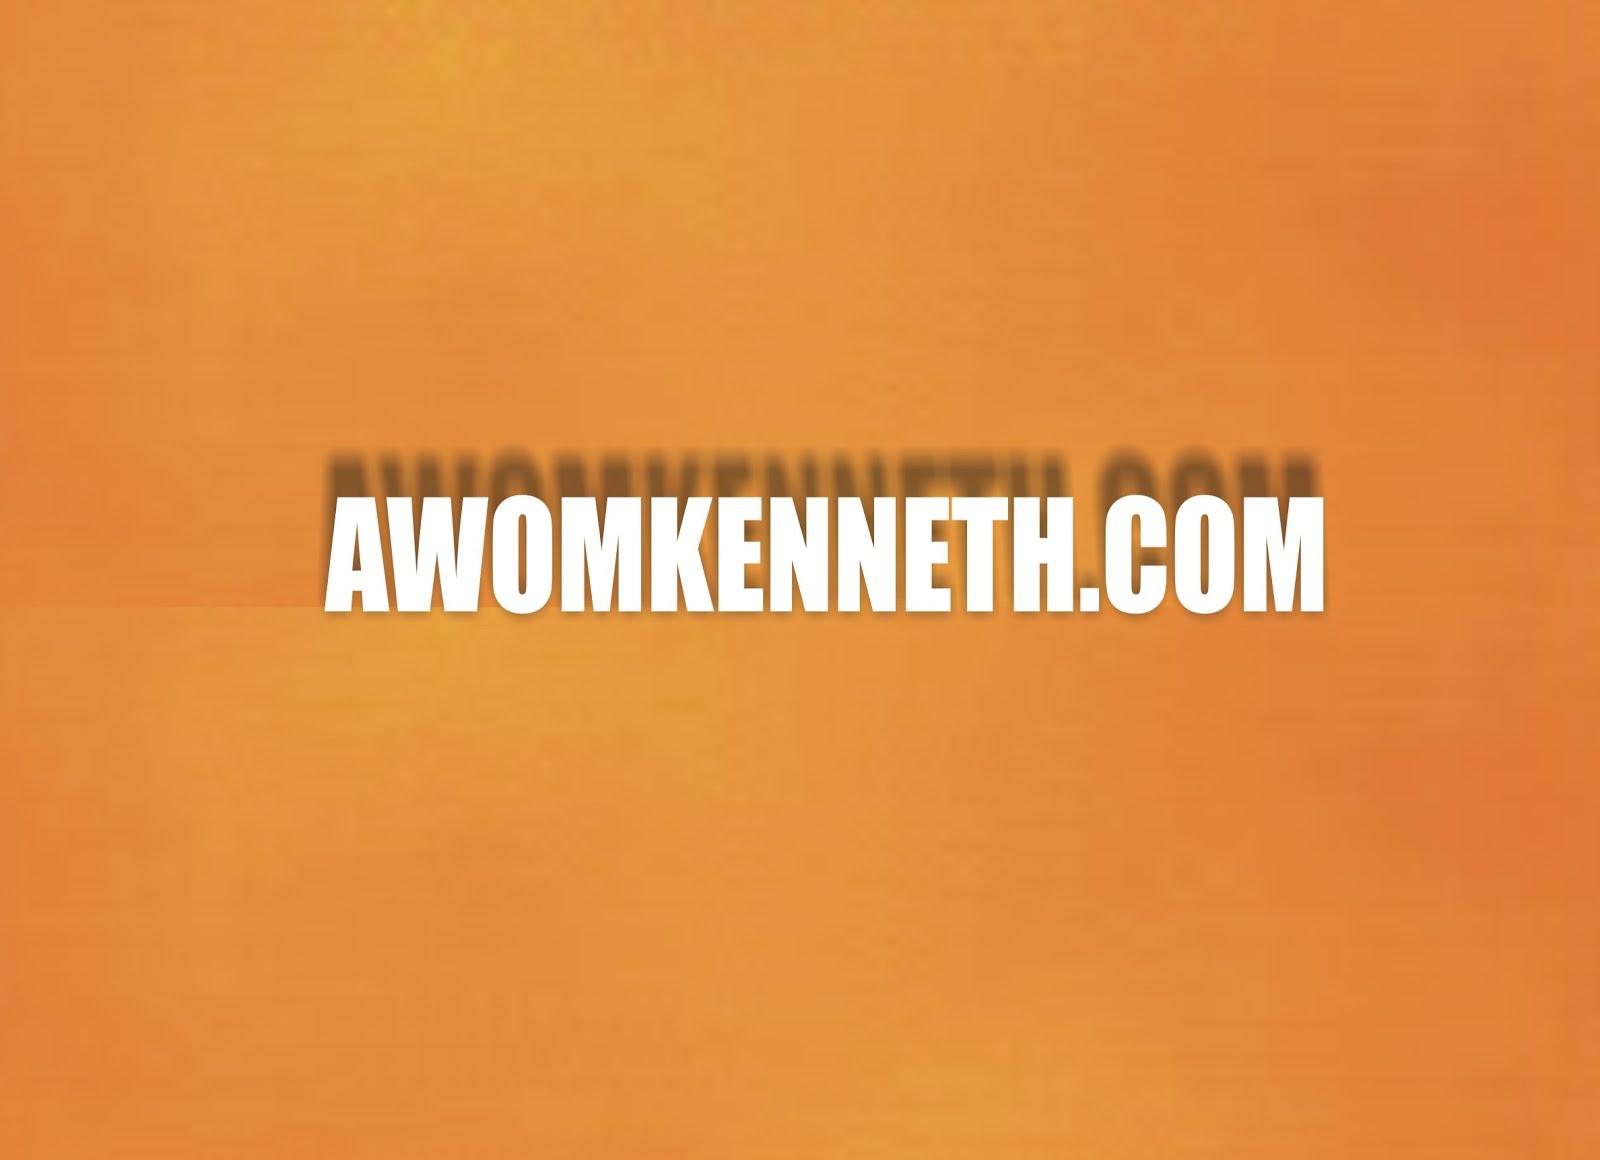 AWOMKENNETH.COM